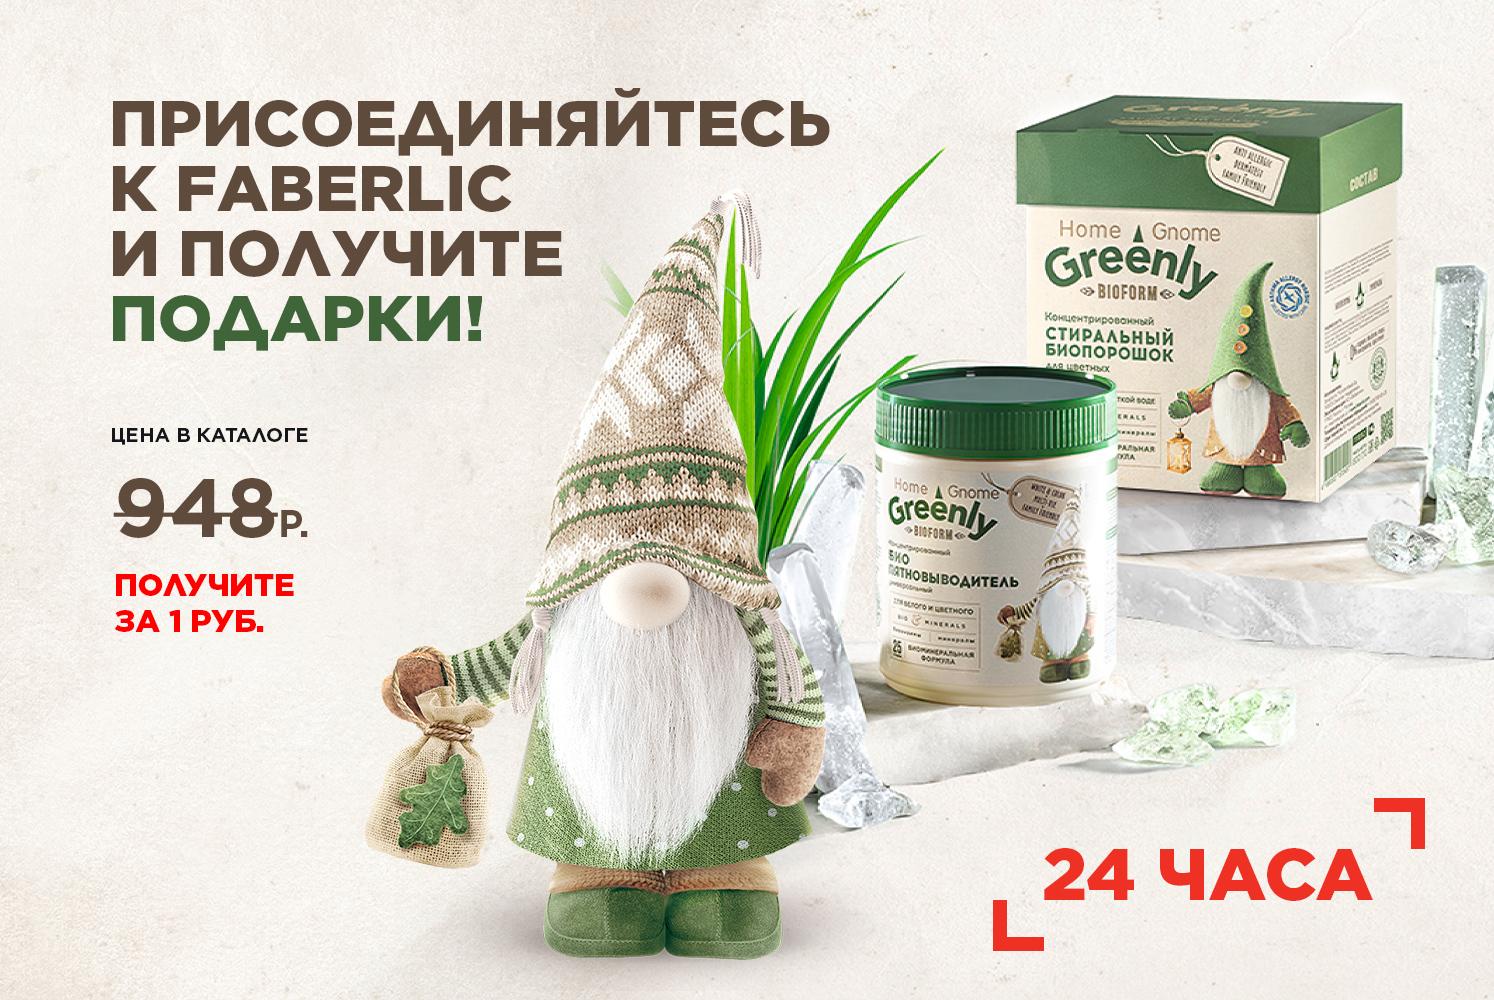 Подарки Фаберлик новичкам 1 каталог